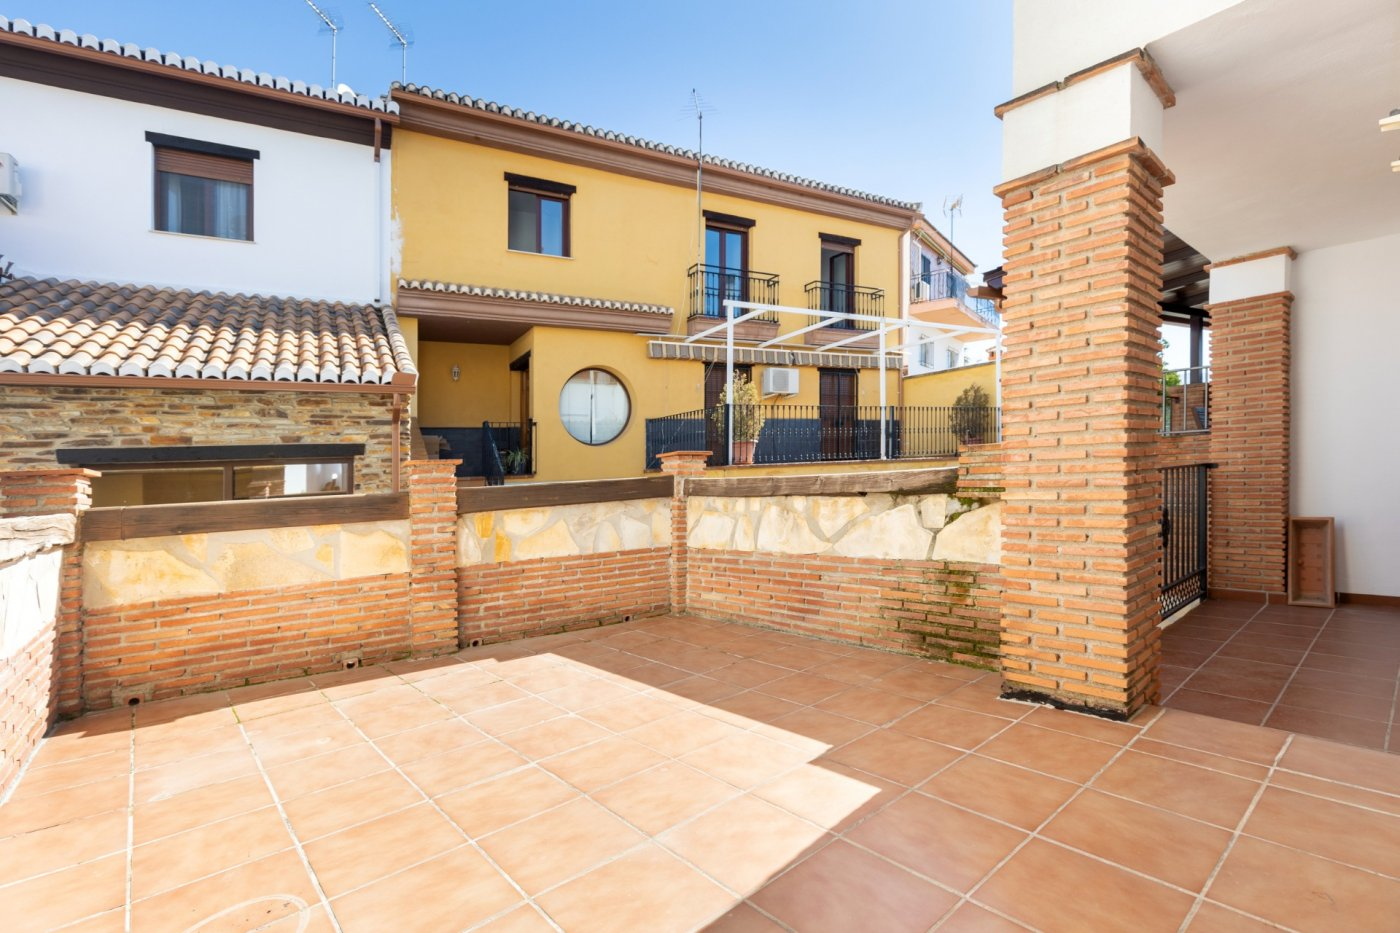 Amplia casa adosada junto al Centro de Huetor Vega, Granada